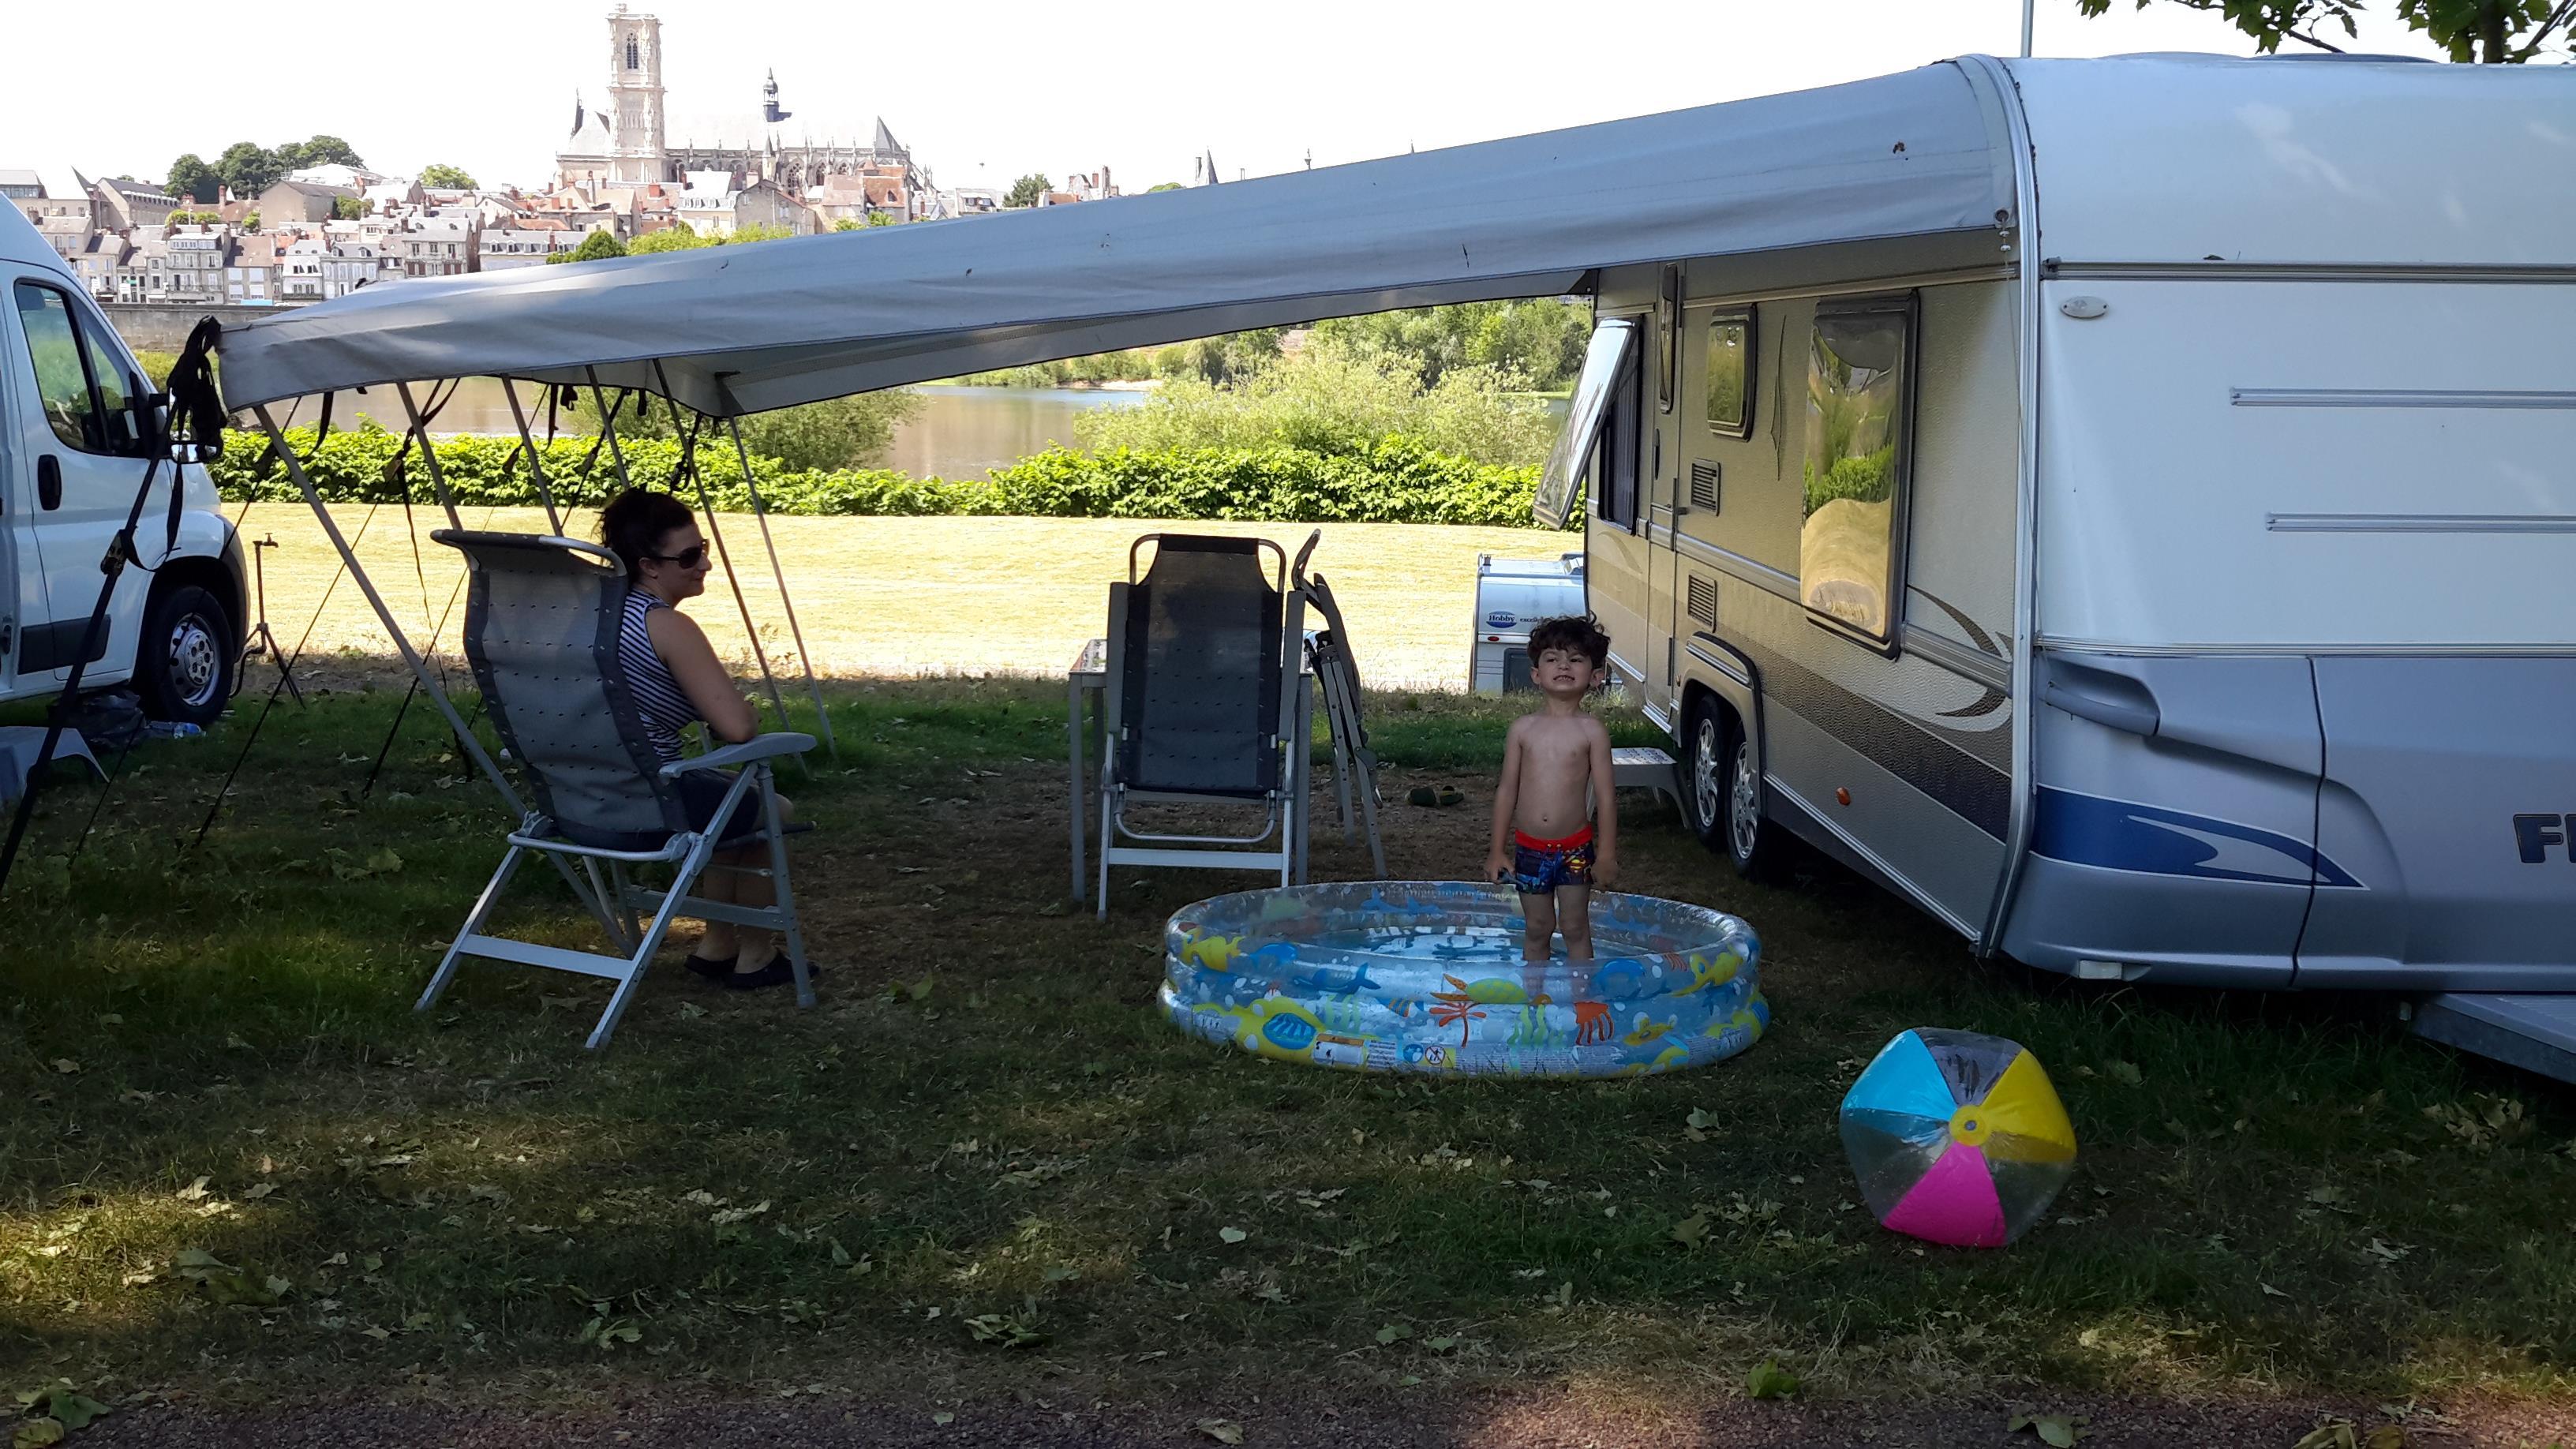 Camping de Nevers, Nevers, Nièvre